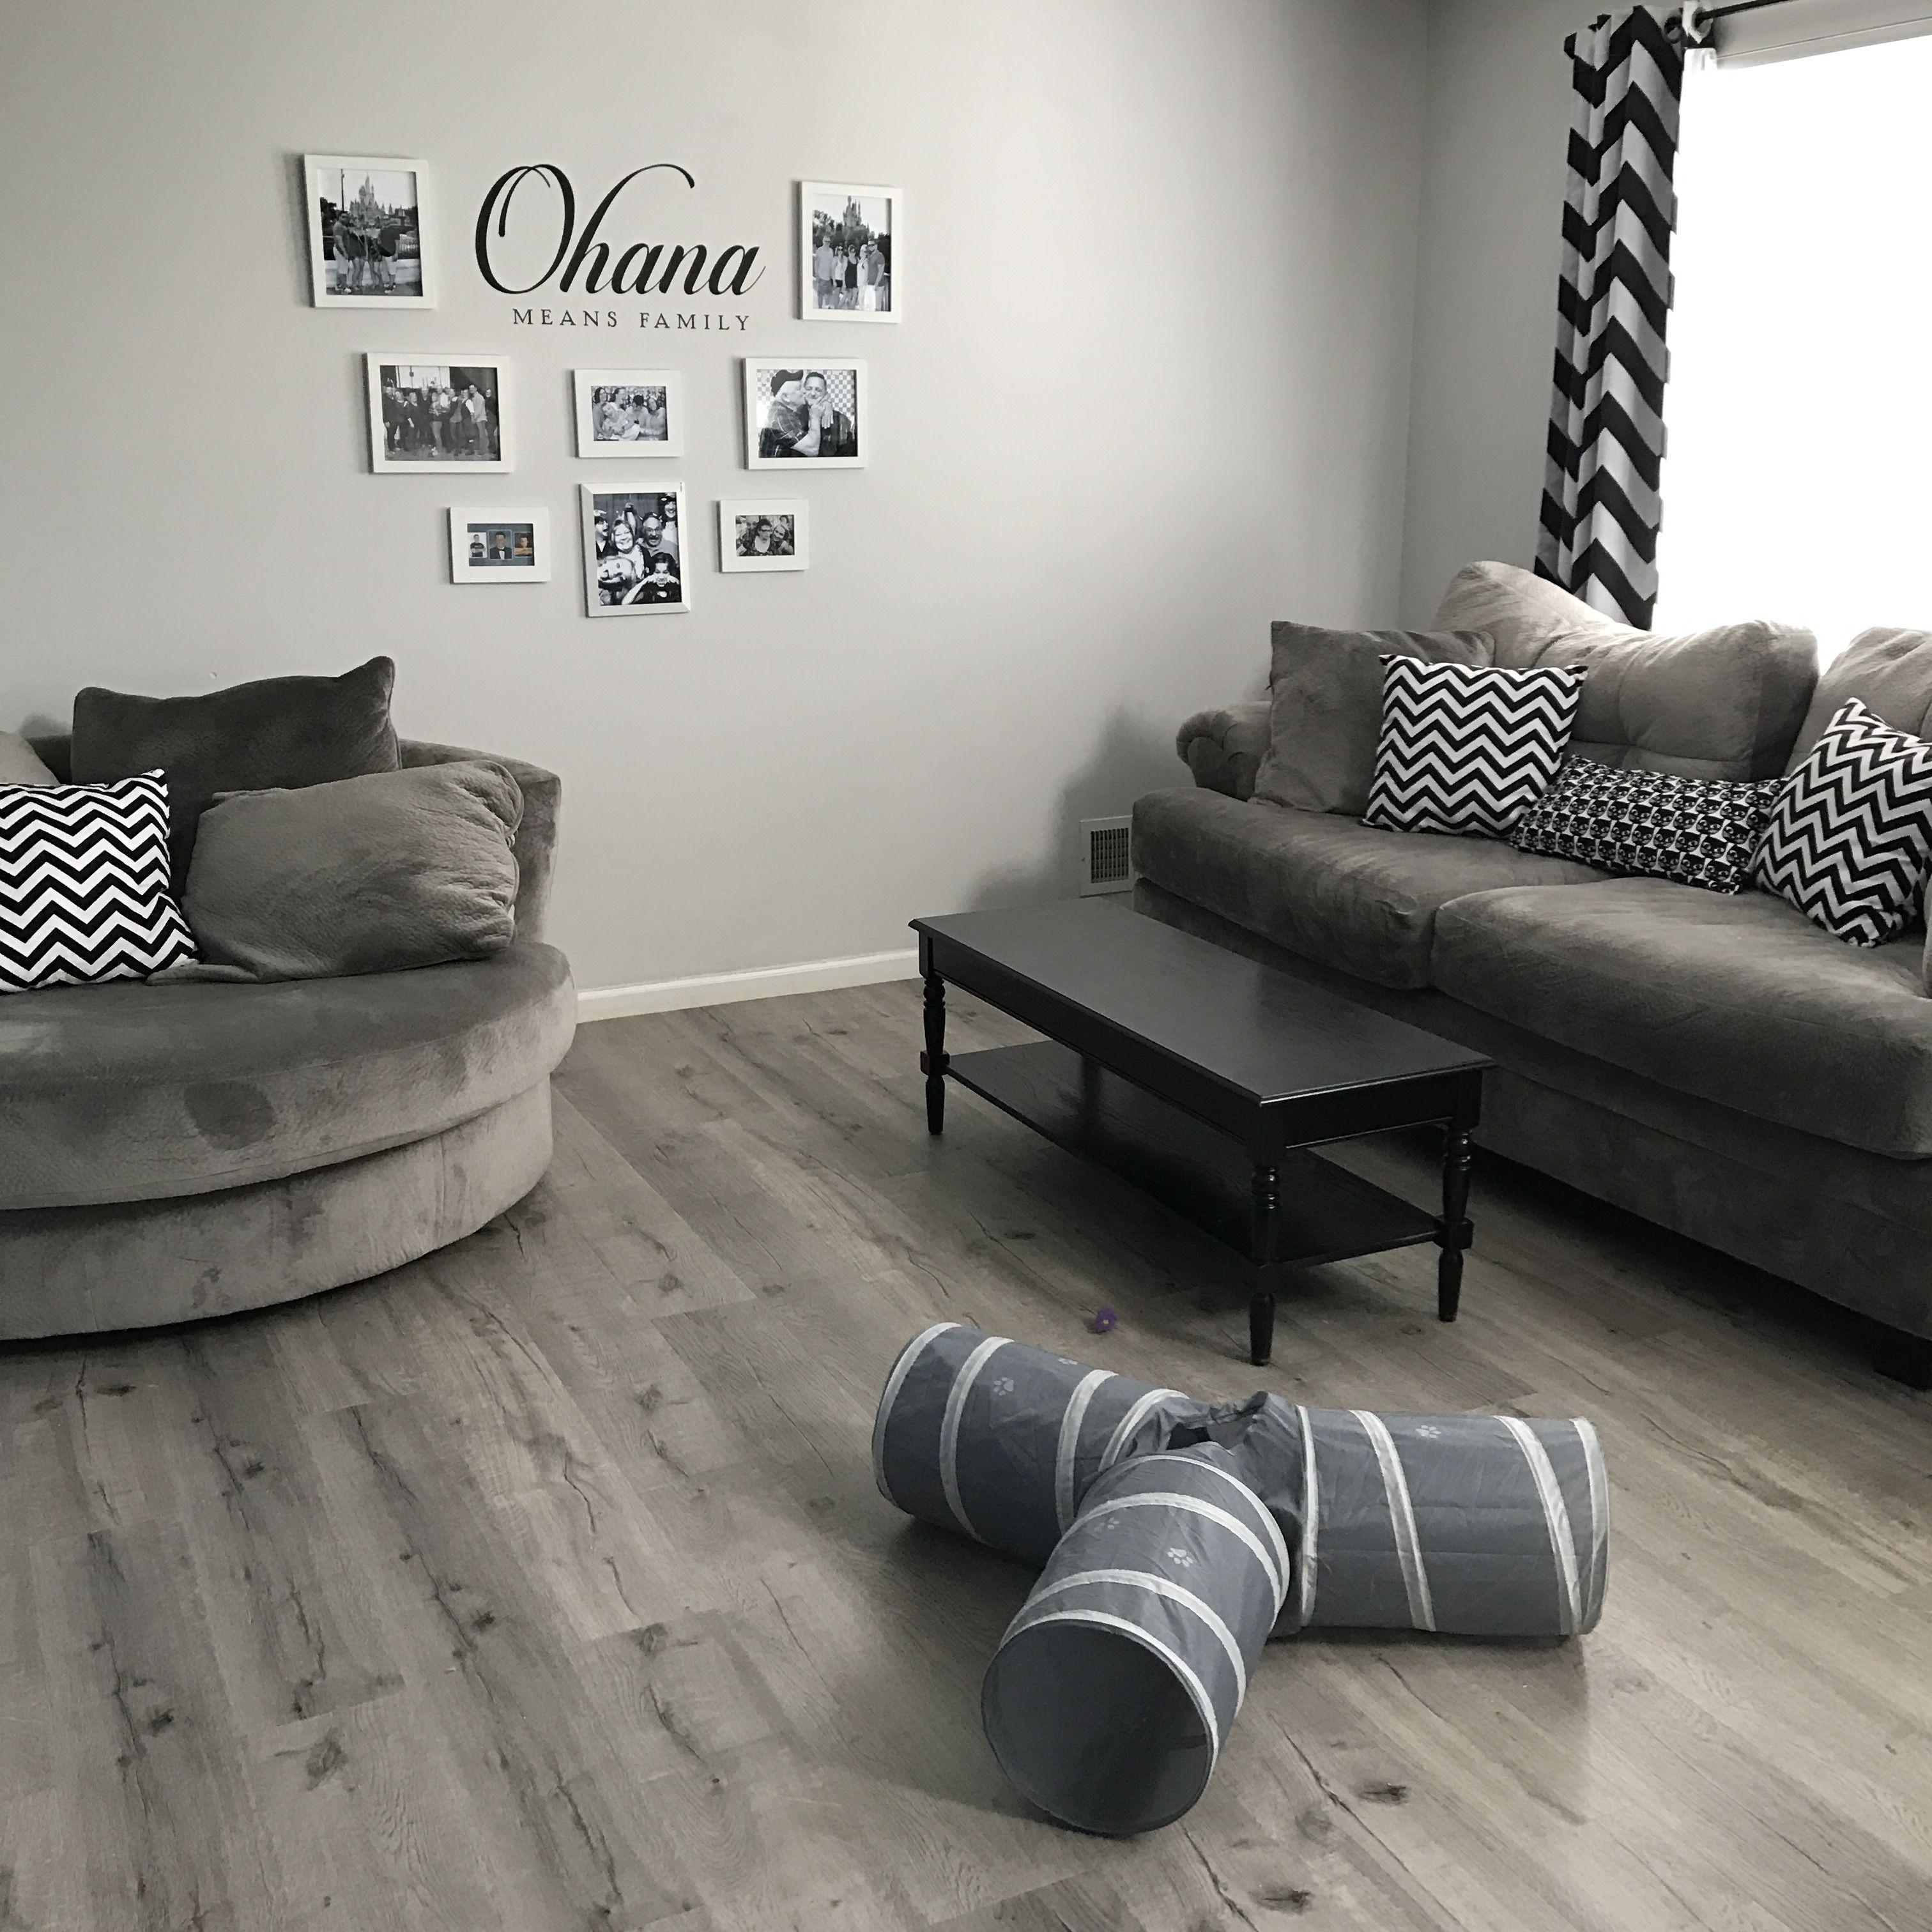 Neutral Grays With Ohana Photo Wall Floors Driftwood Hickory From Lumber Liquidators Furniture Ashley Furni Furniture Natural Living Room Decor Grey Flooring